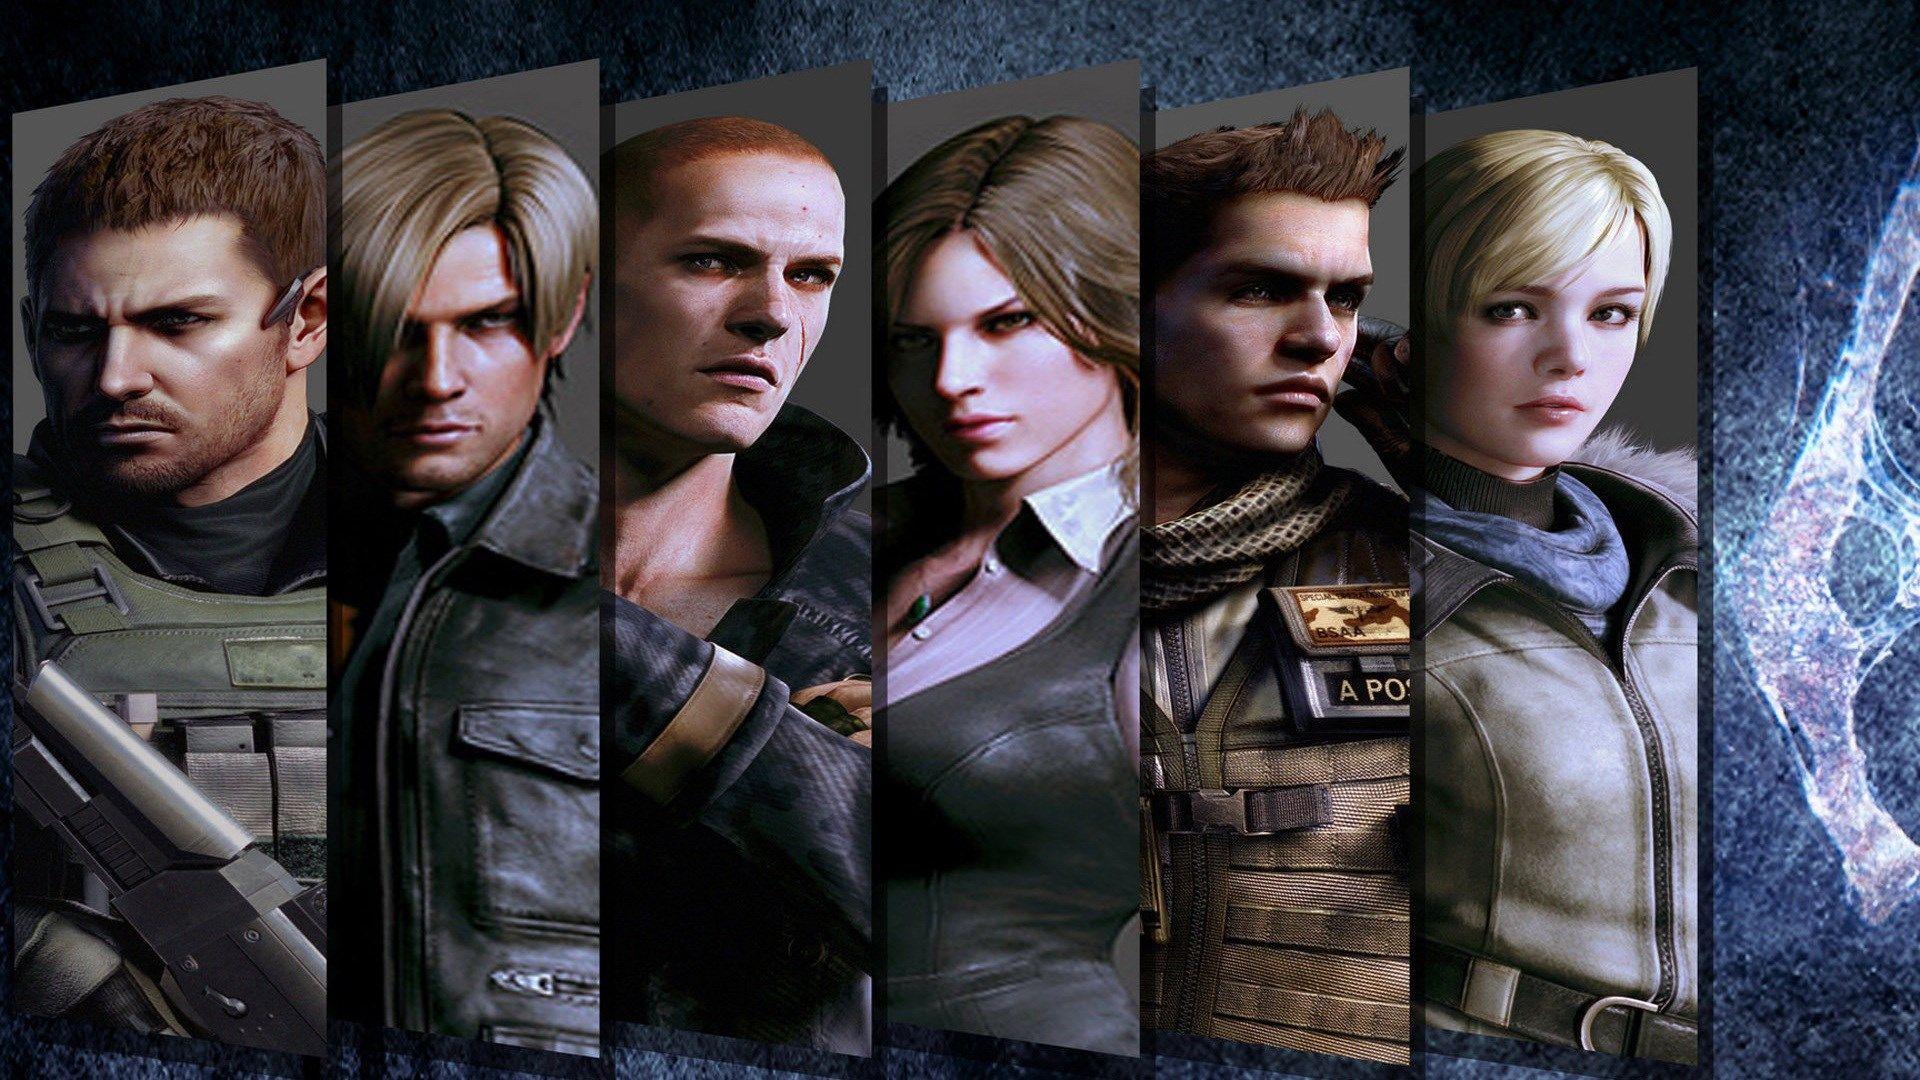 1920x1080 Resident Evil 6 game wallpaper Дайвинг